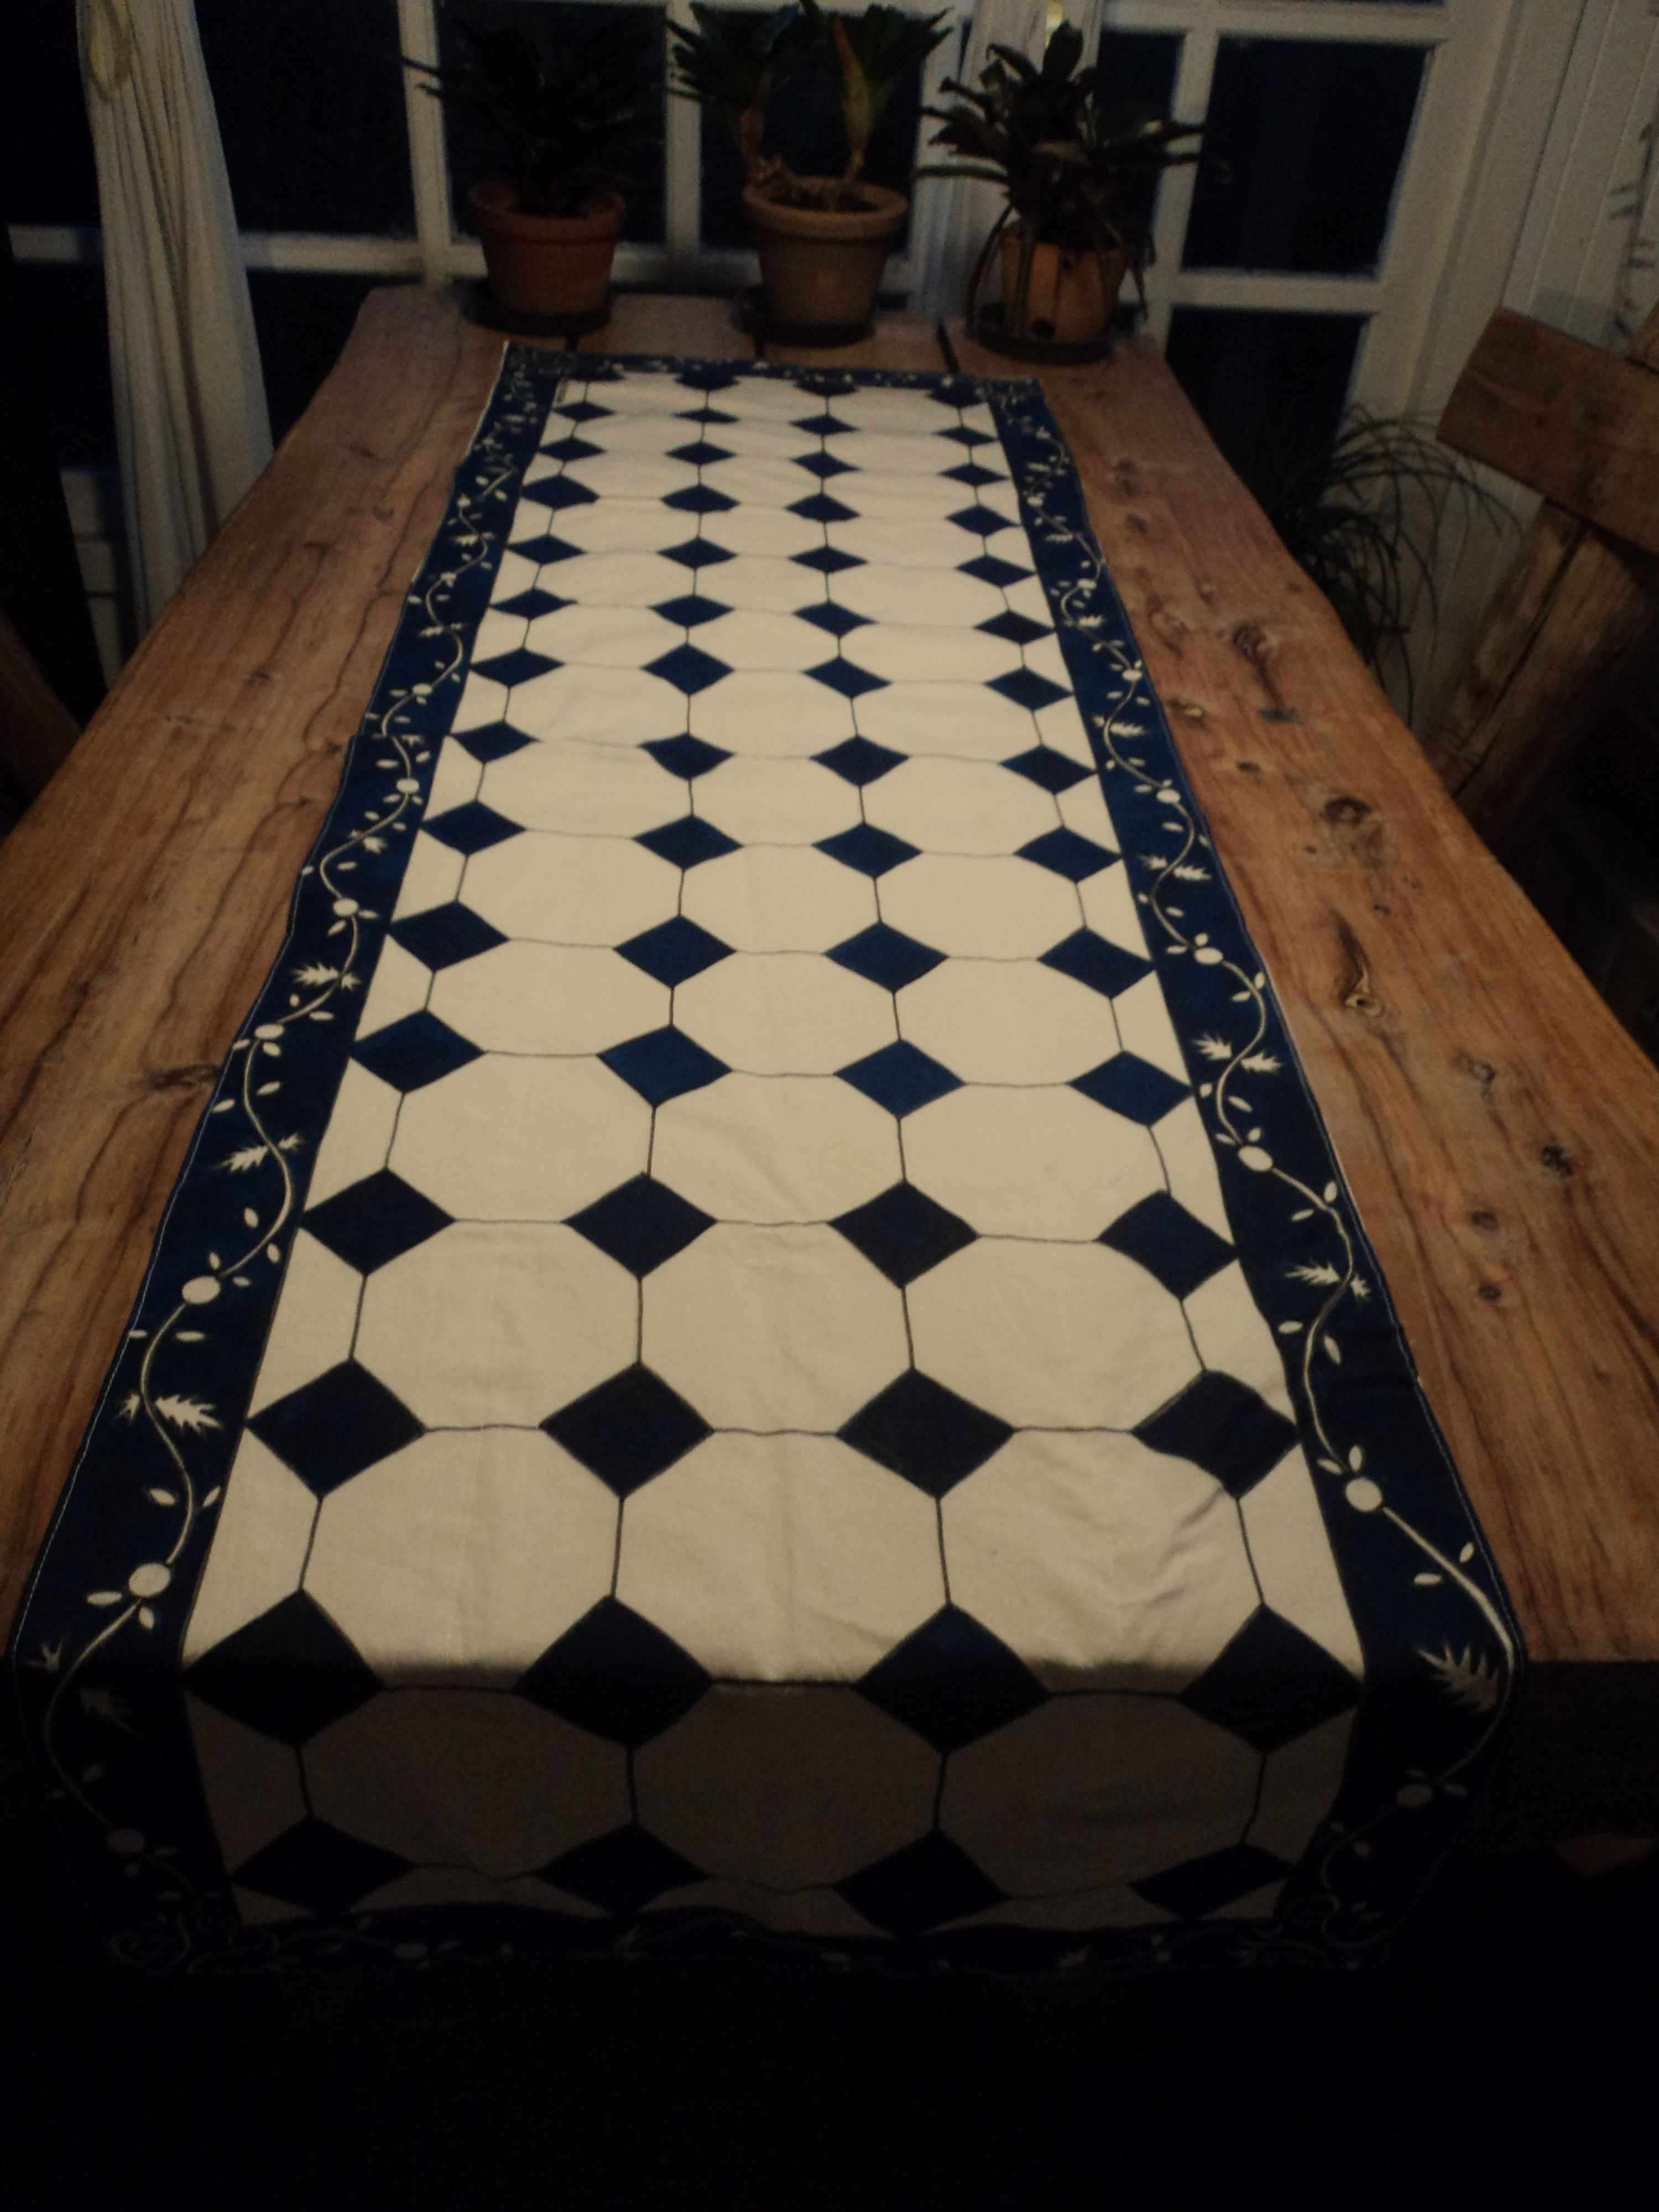 Caminho de mesa azulejo hidr ulico clientes pinterest - Mesas de azulejos ...